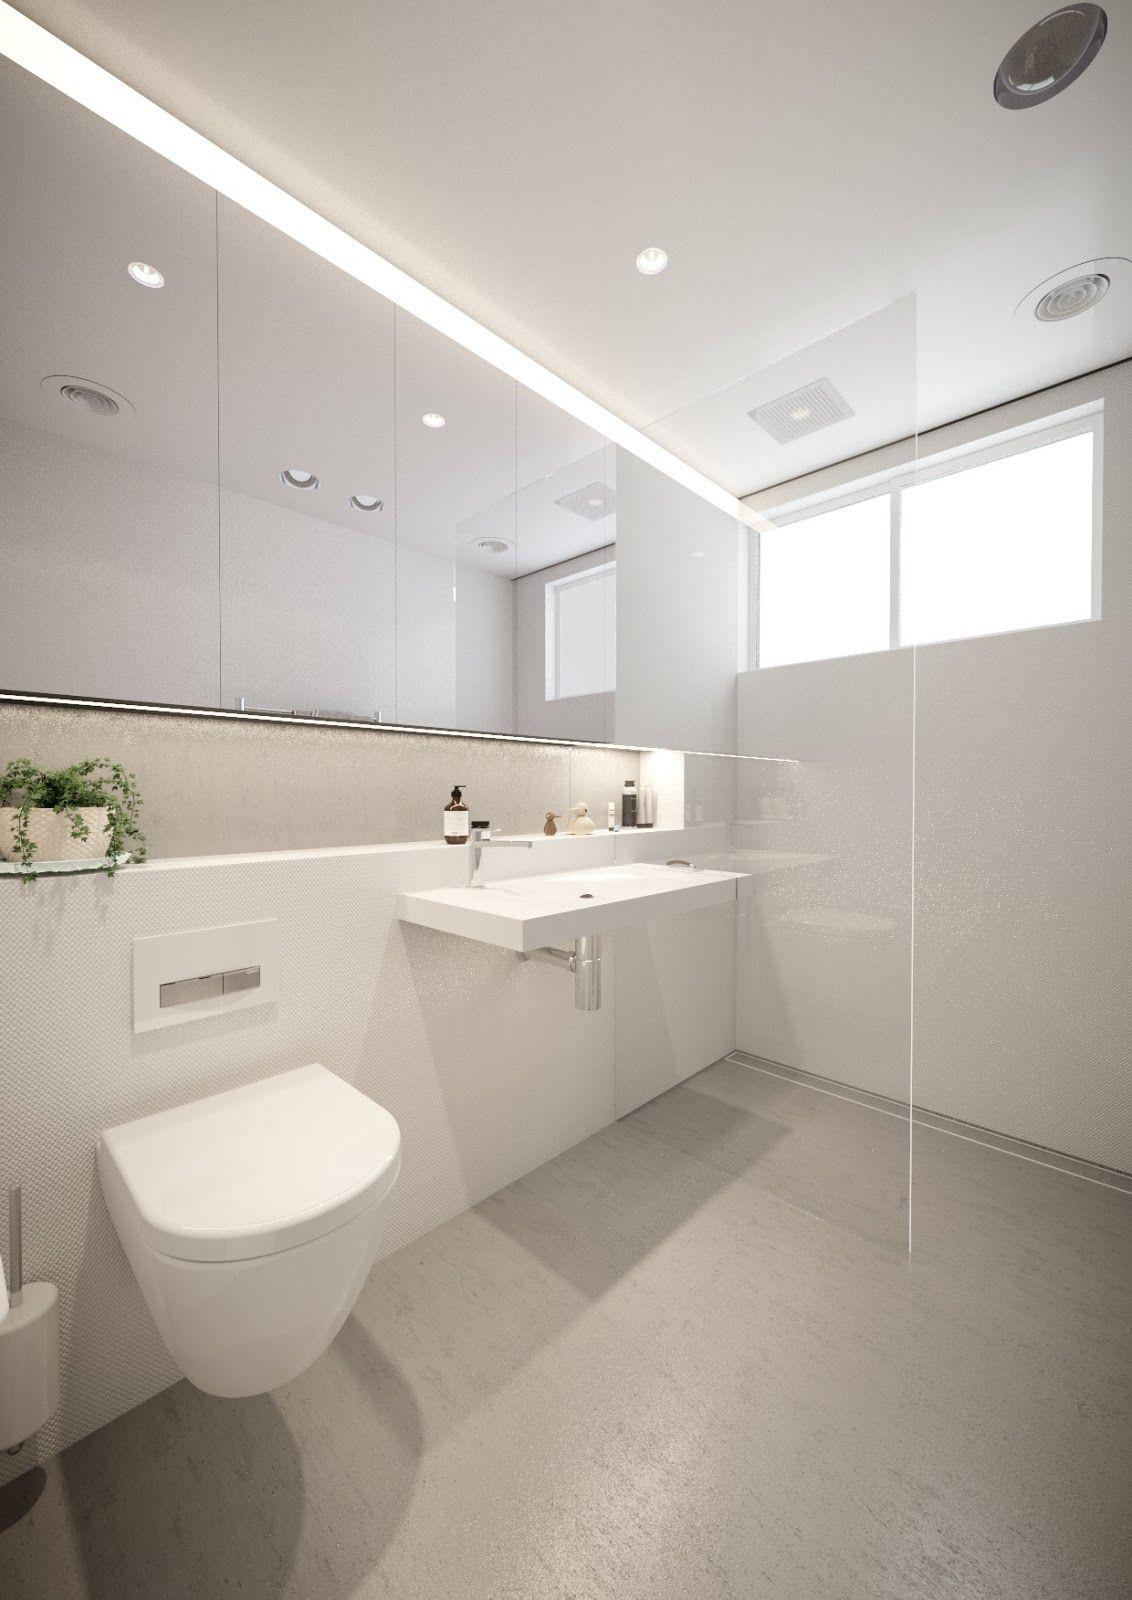 Modern Kitchen And Bathroom Design Solutions Award Winning Design Studio For The Kitchen Accessible Bathroom Design Small Bathroom Bathroom Furniture Modern